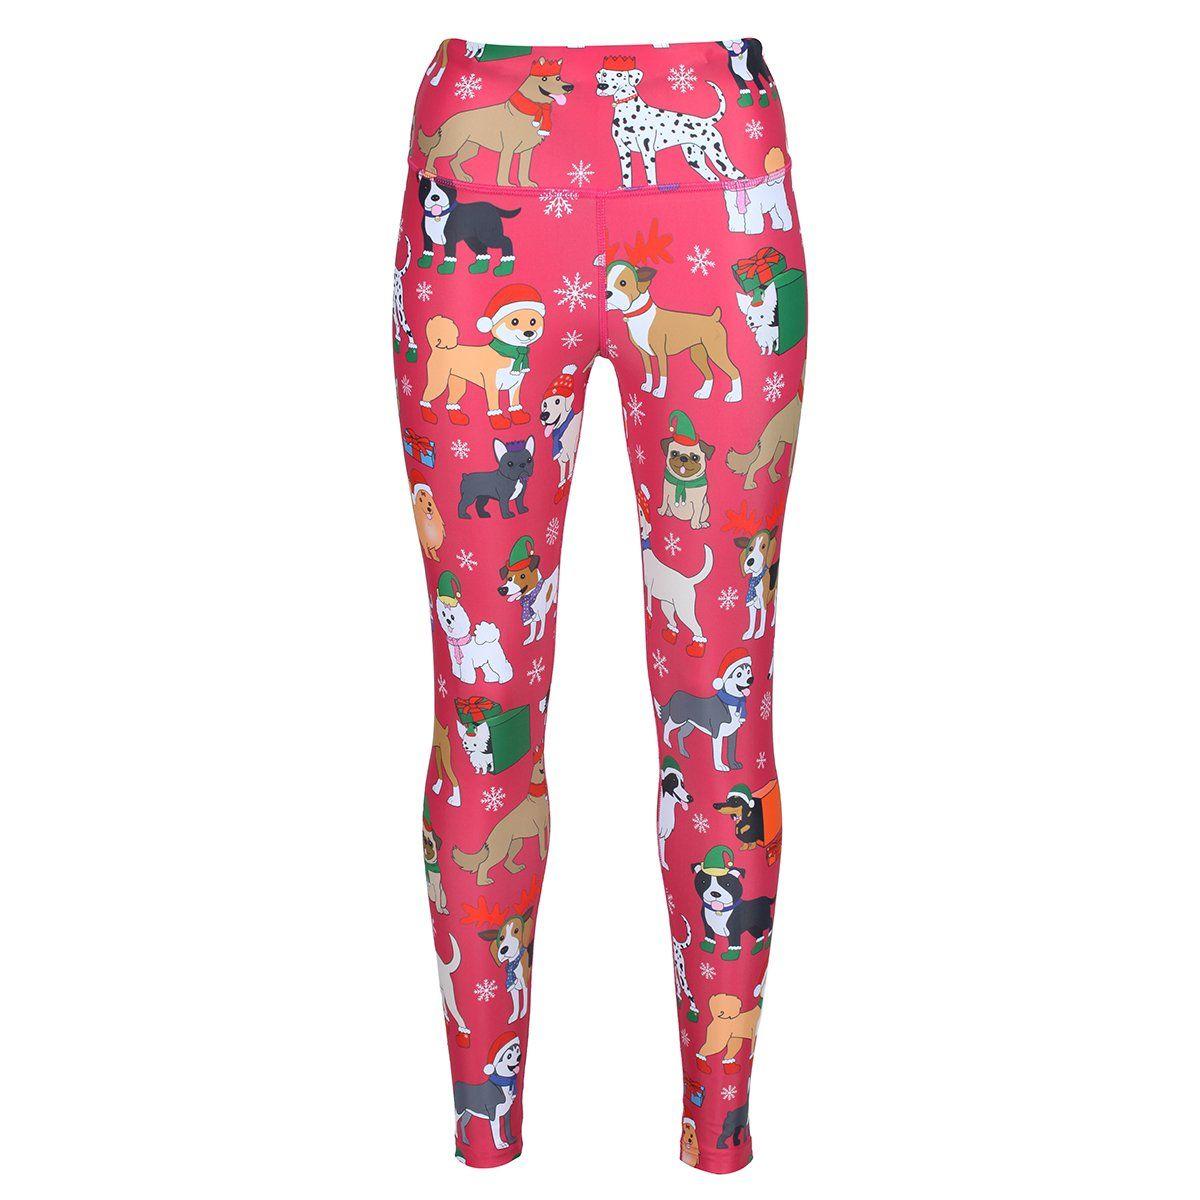 Xmas Womens Christmas Printed Yoga Pants Fitness Leggings Gym Sports Trousers UK